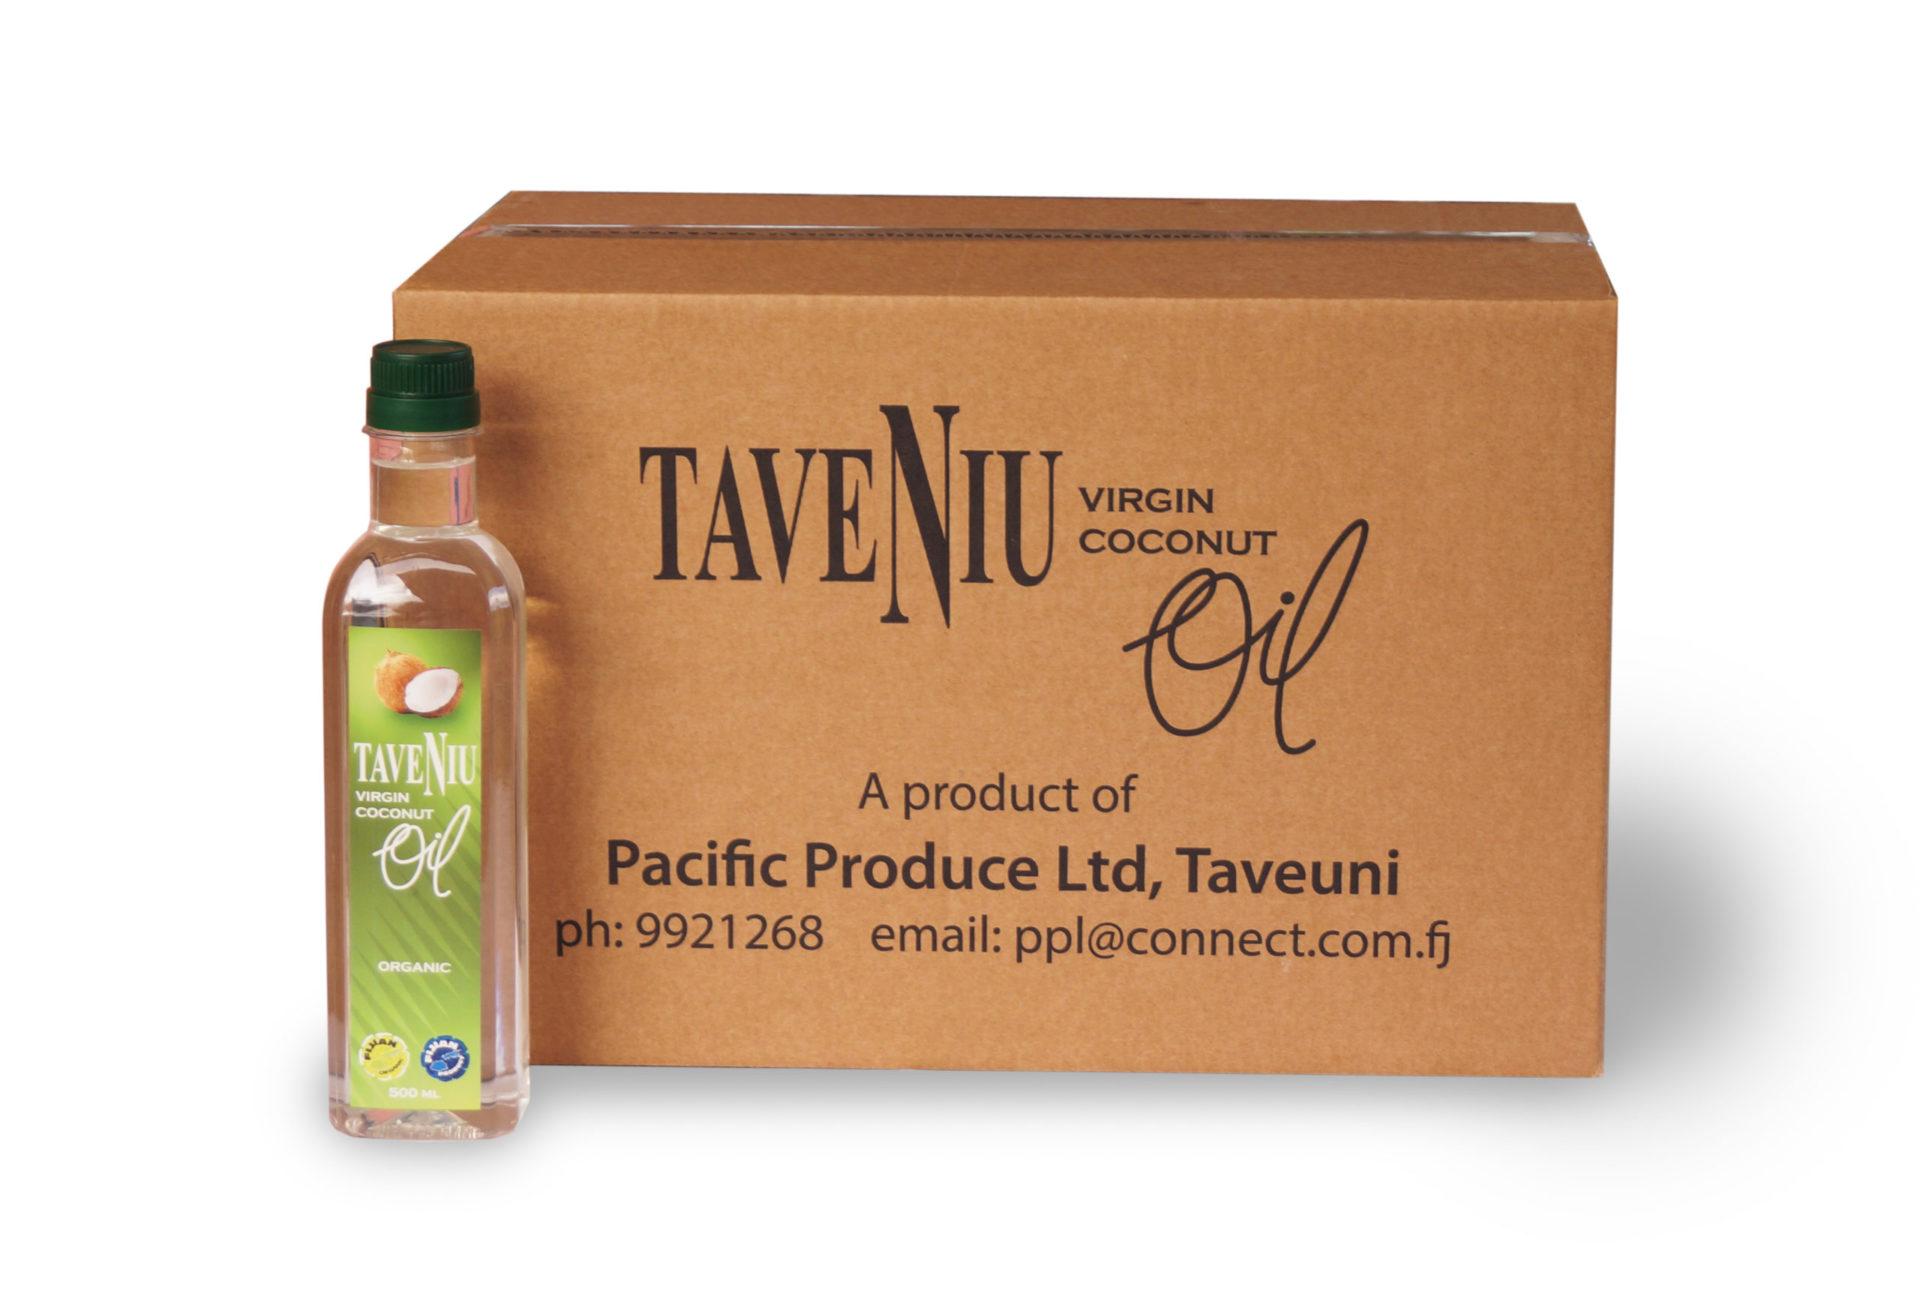 TaveNiu Virgin Coconut Oil Product Photos (3)